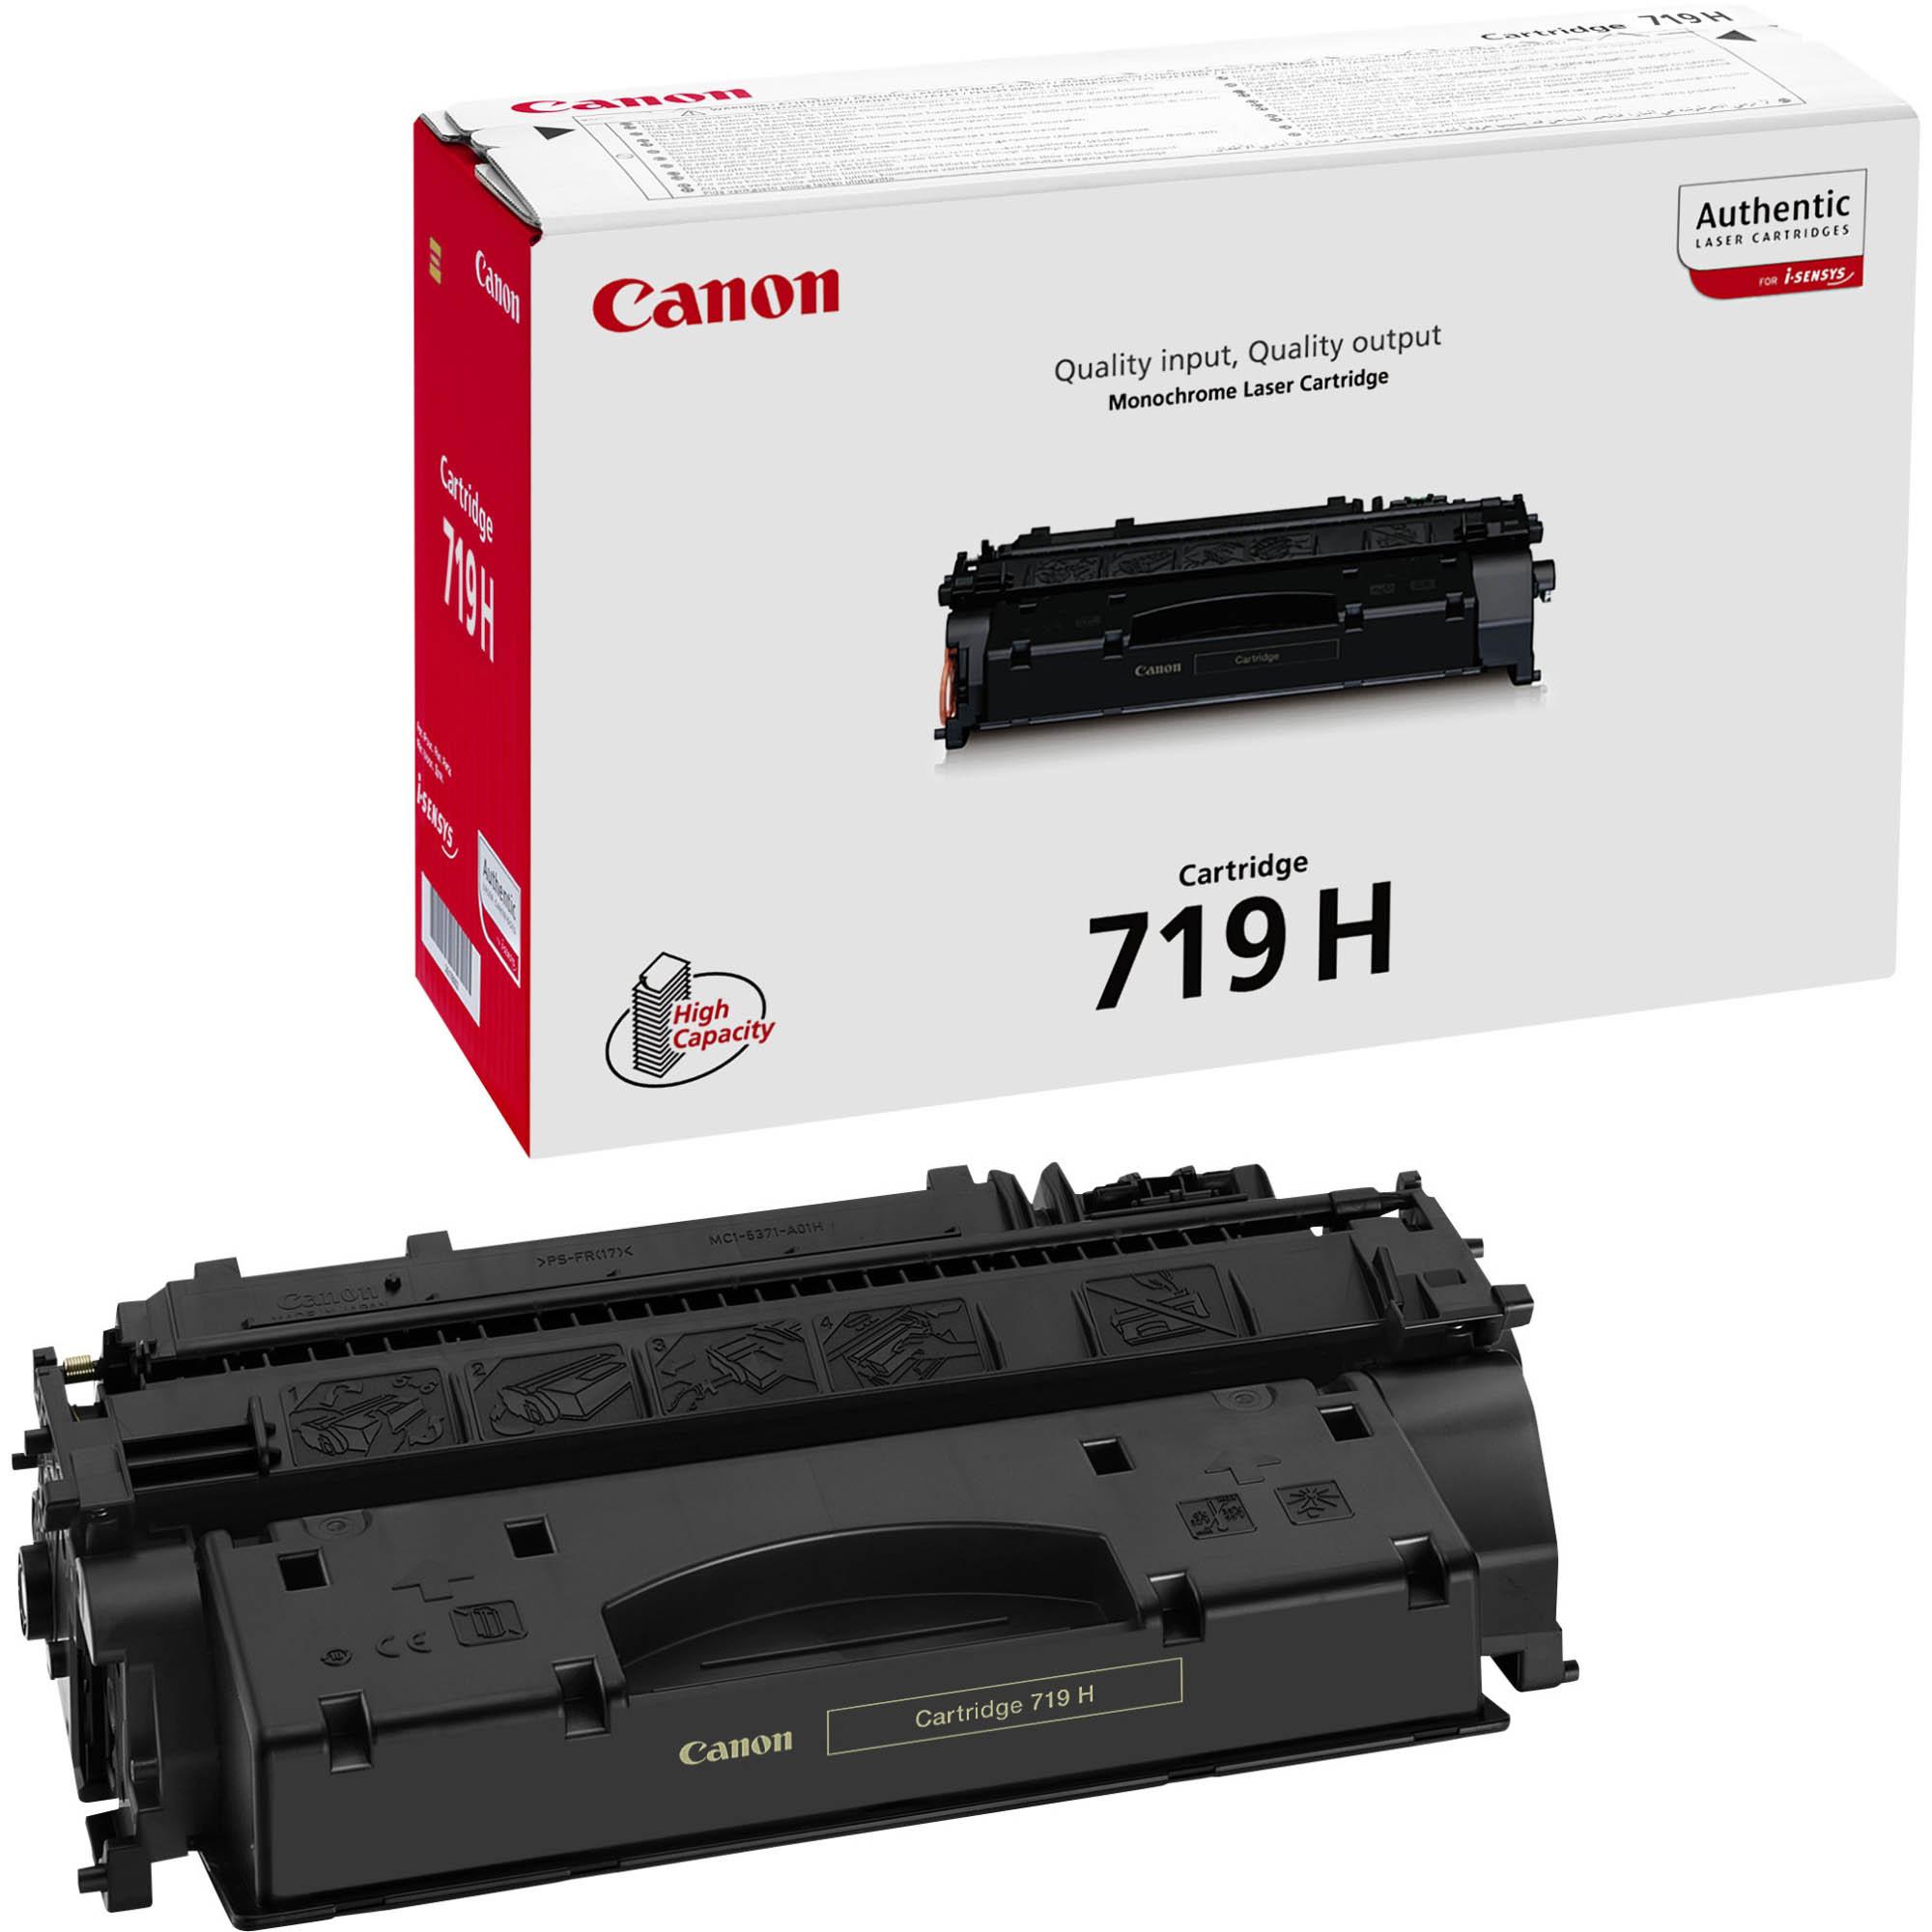 Original Canon 719H Black High Capacity Toner Cartridge (3480B002AA)